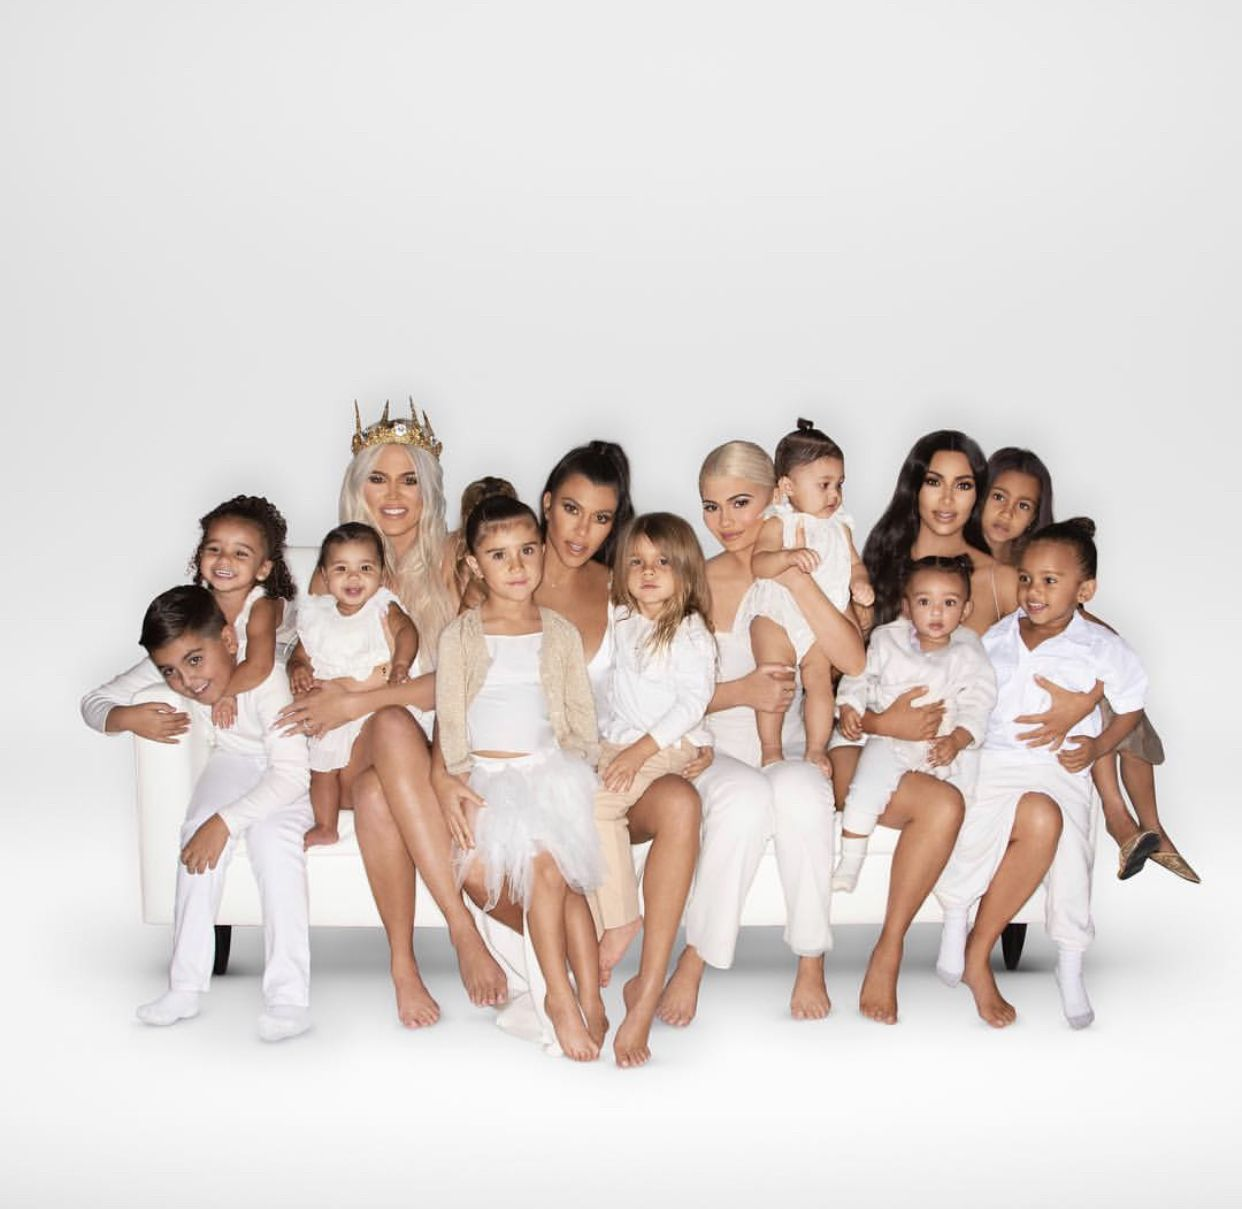 2018 Christmas Card Kardashian Jenner Christmas Card Kardashian